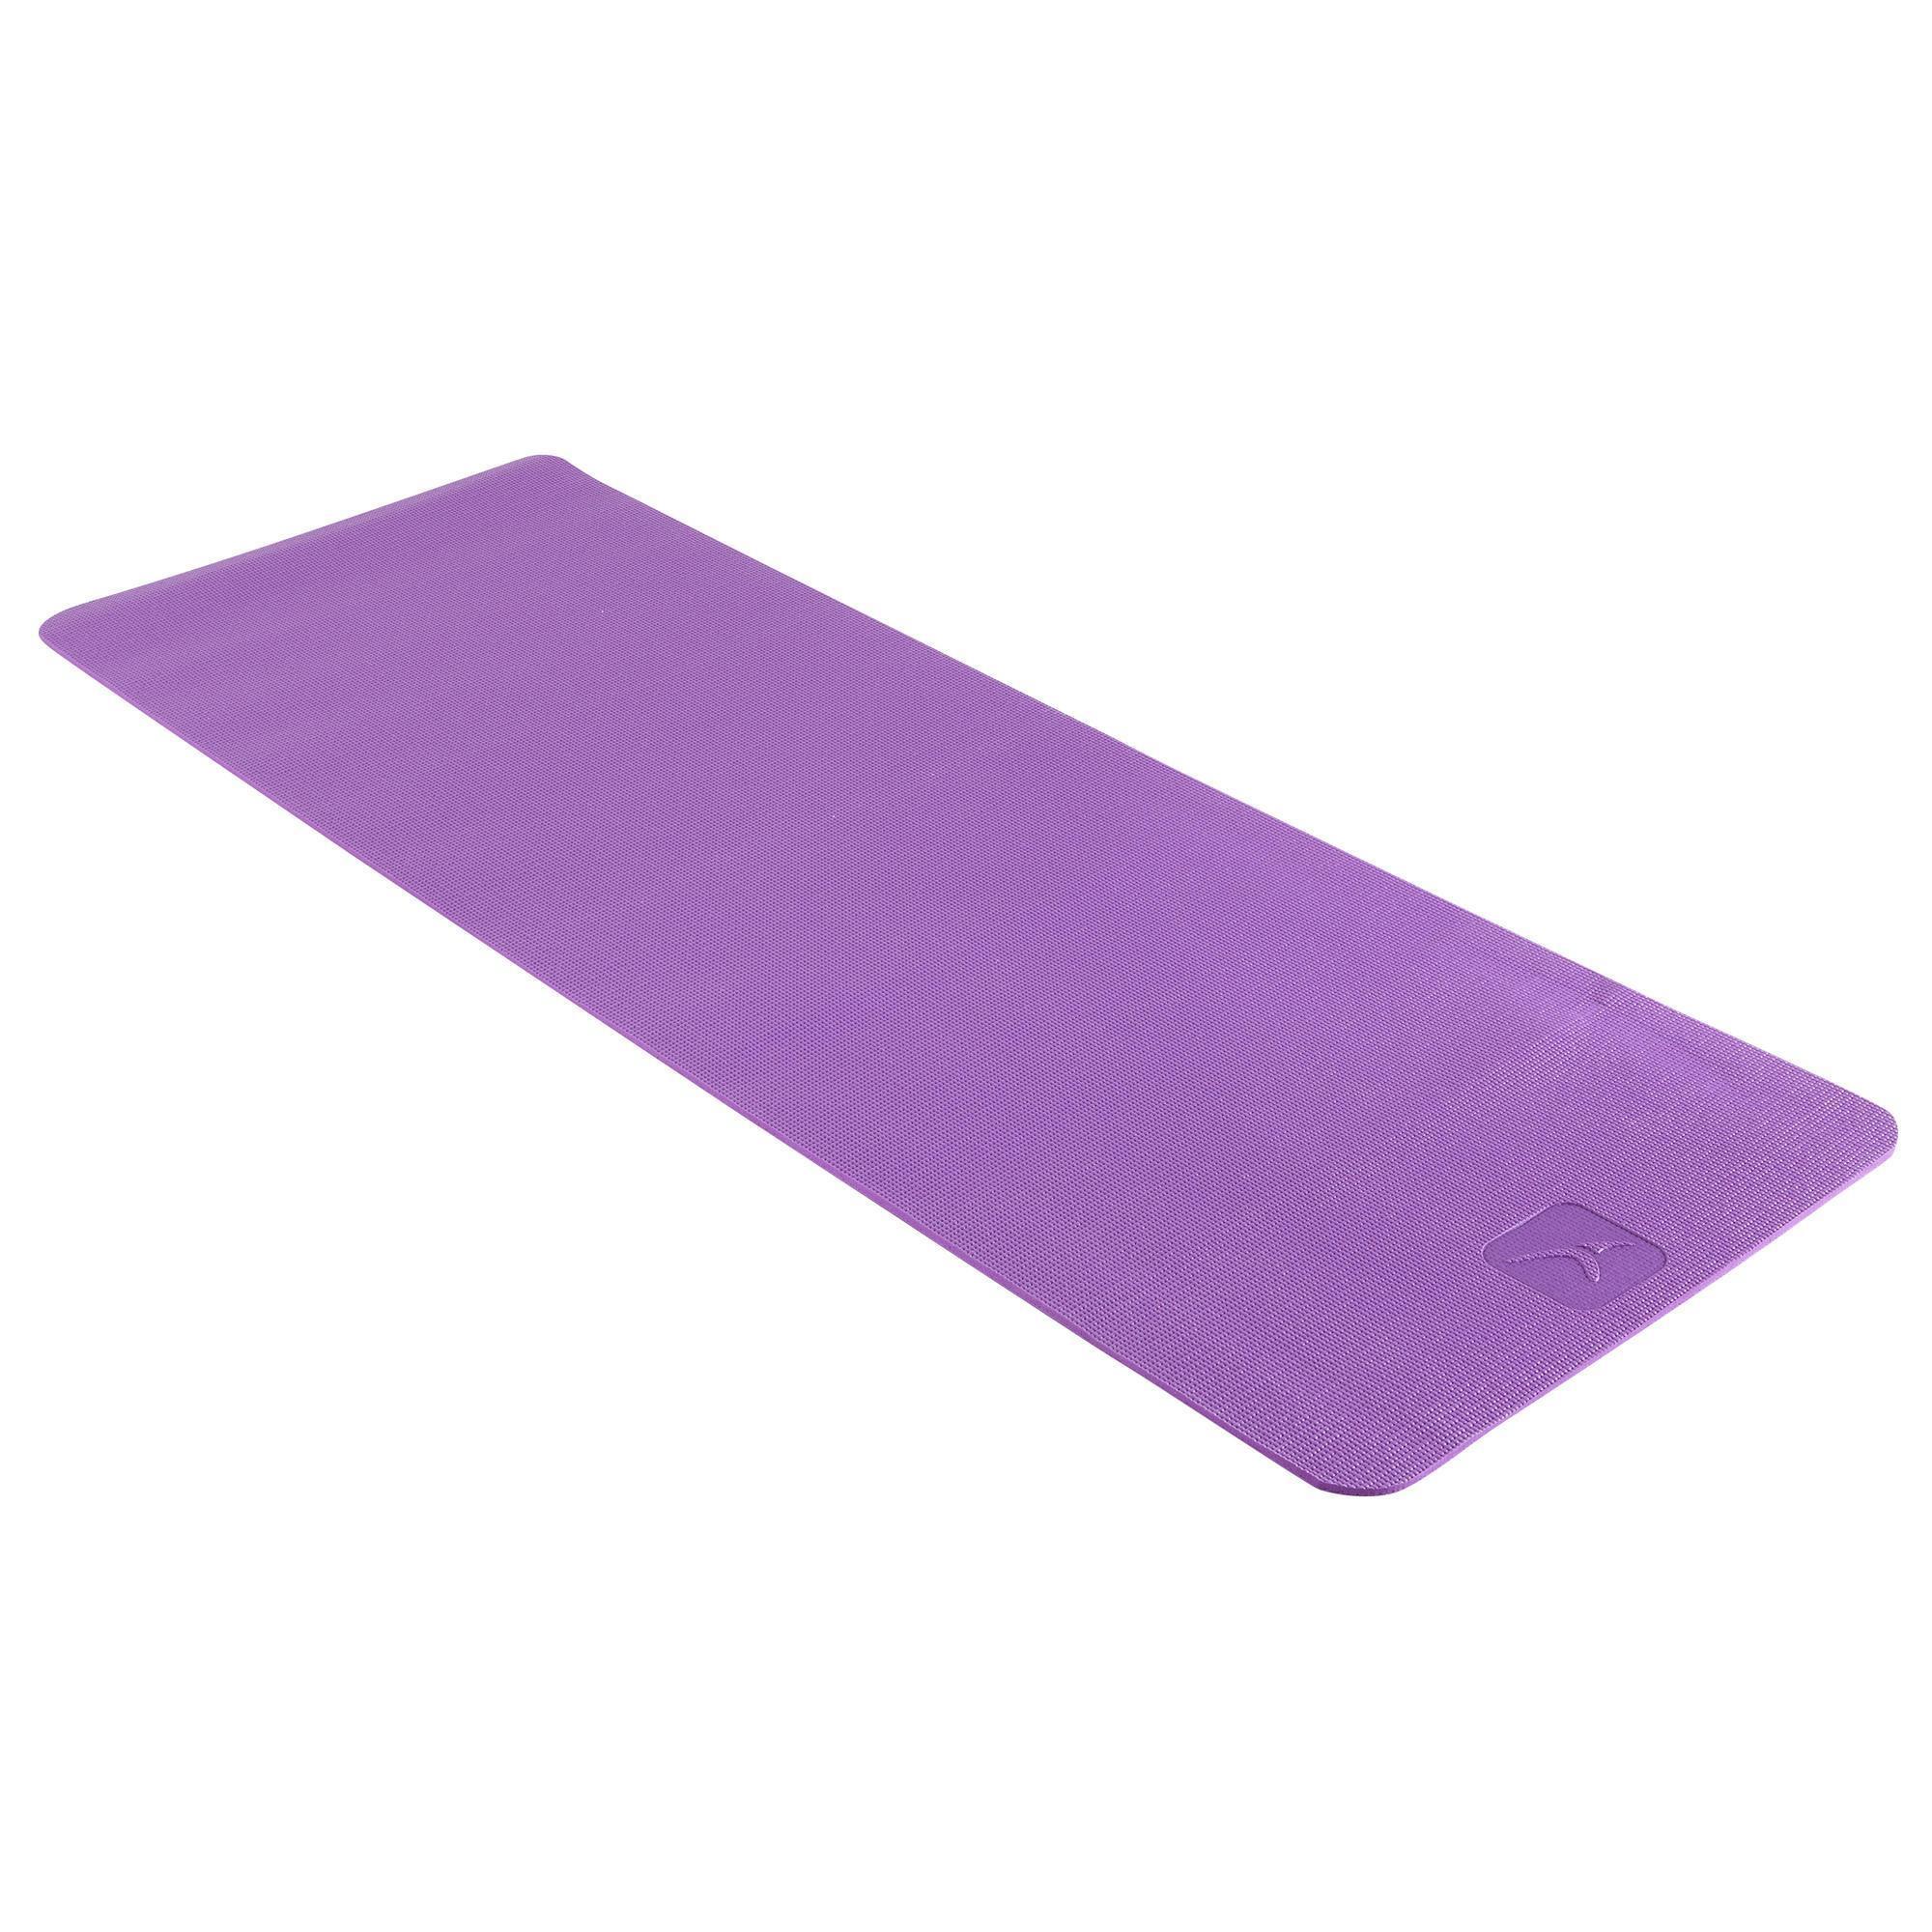 Yogamatte für sanftes Yoga 8 mm lila   03608419401493